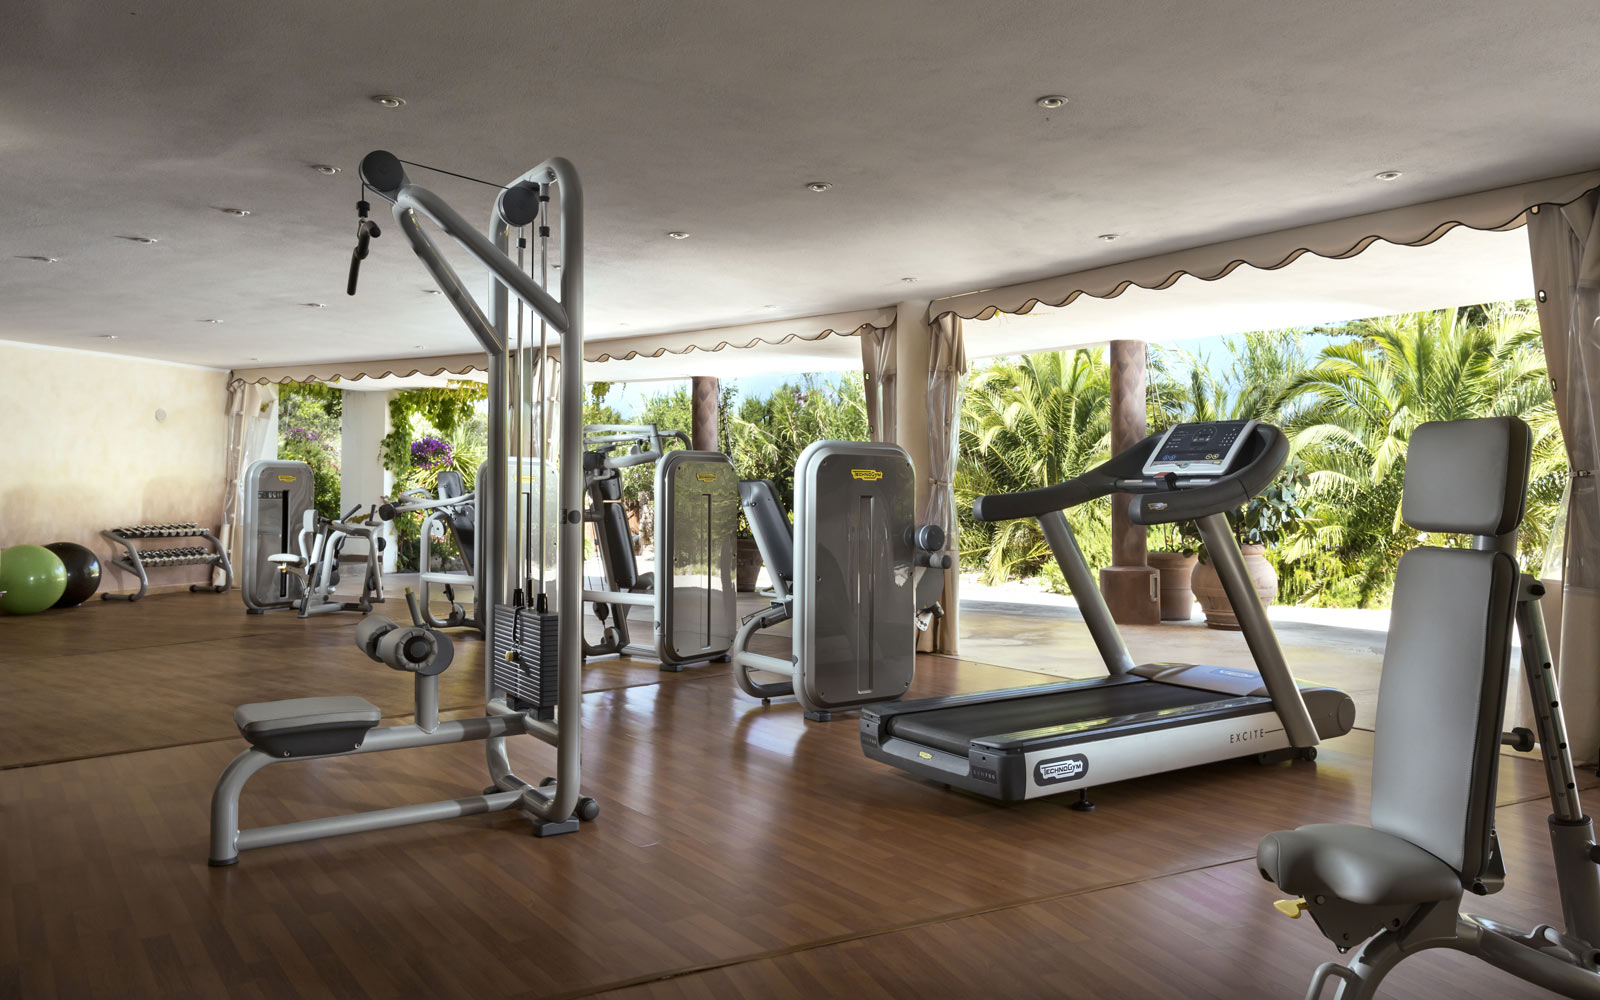 Gym at Marinedda Thalasso & Spa